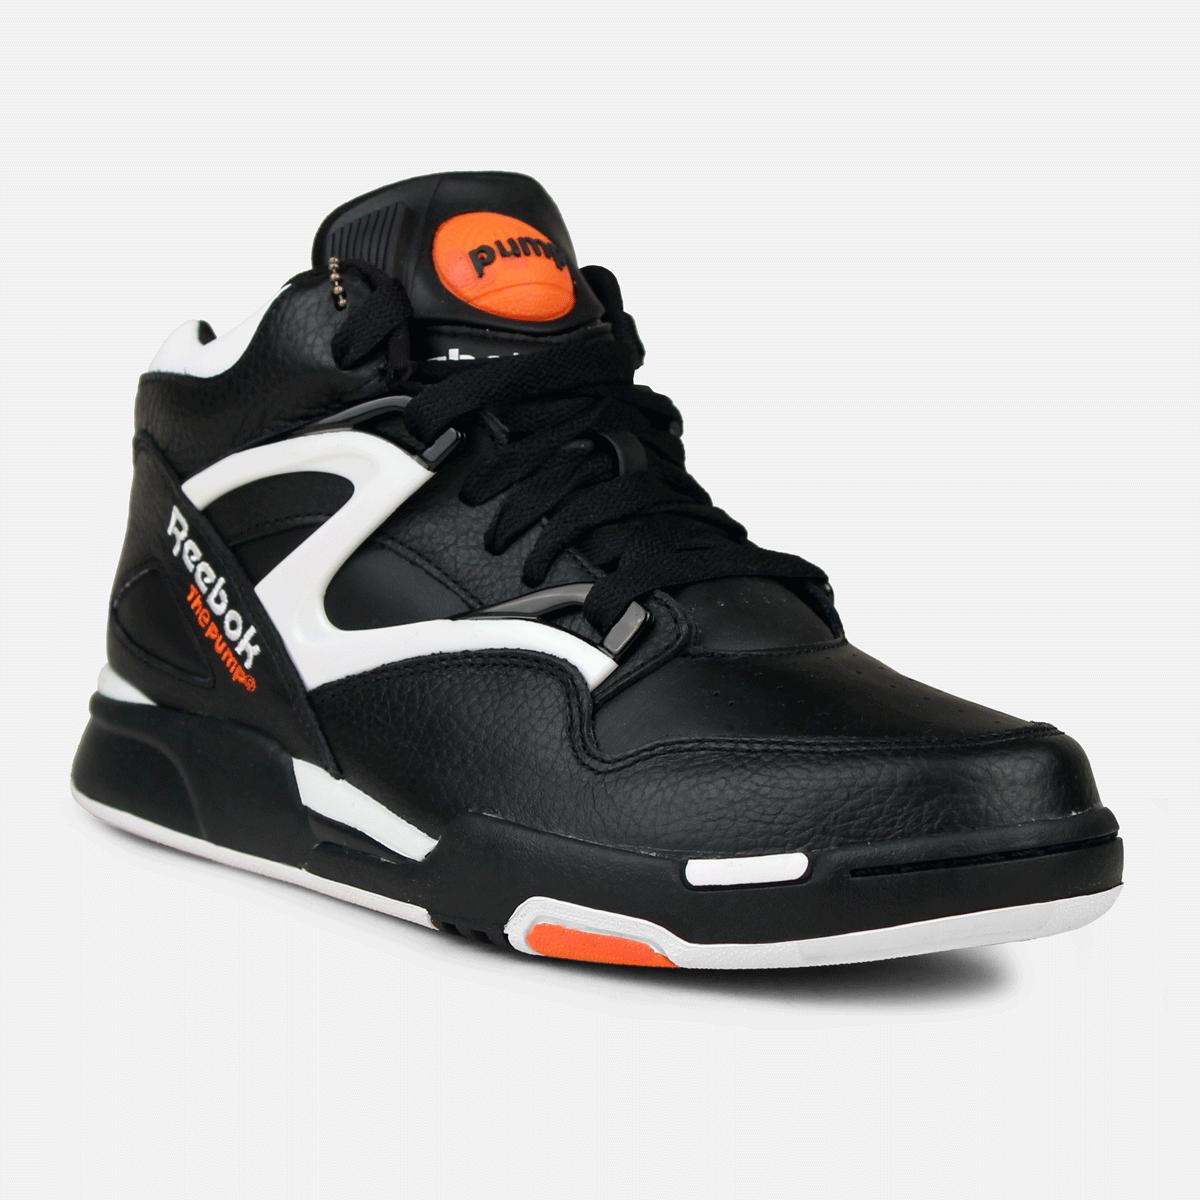 reebok_pump omni lite_dee brown | Calzado masculino, Zapatos